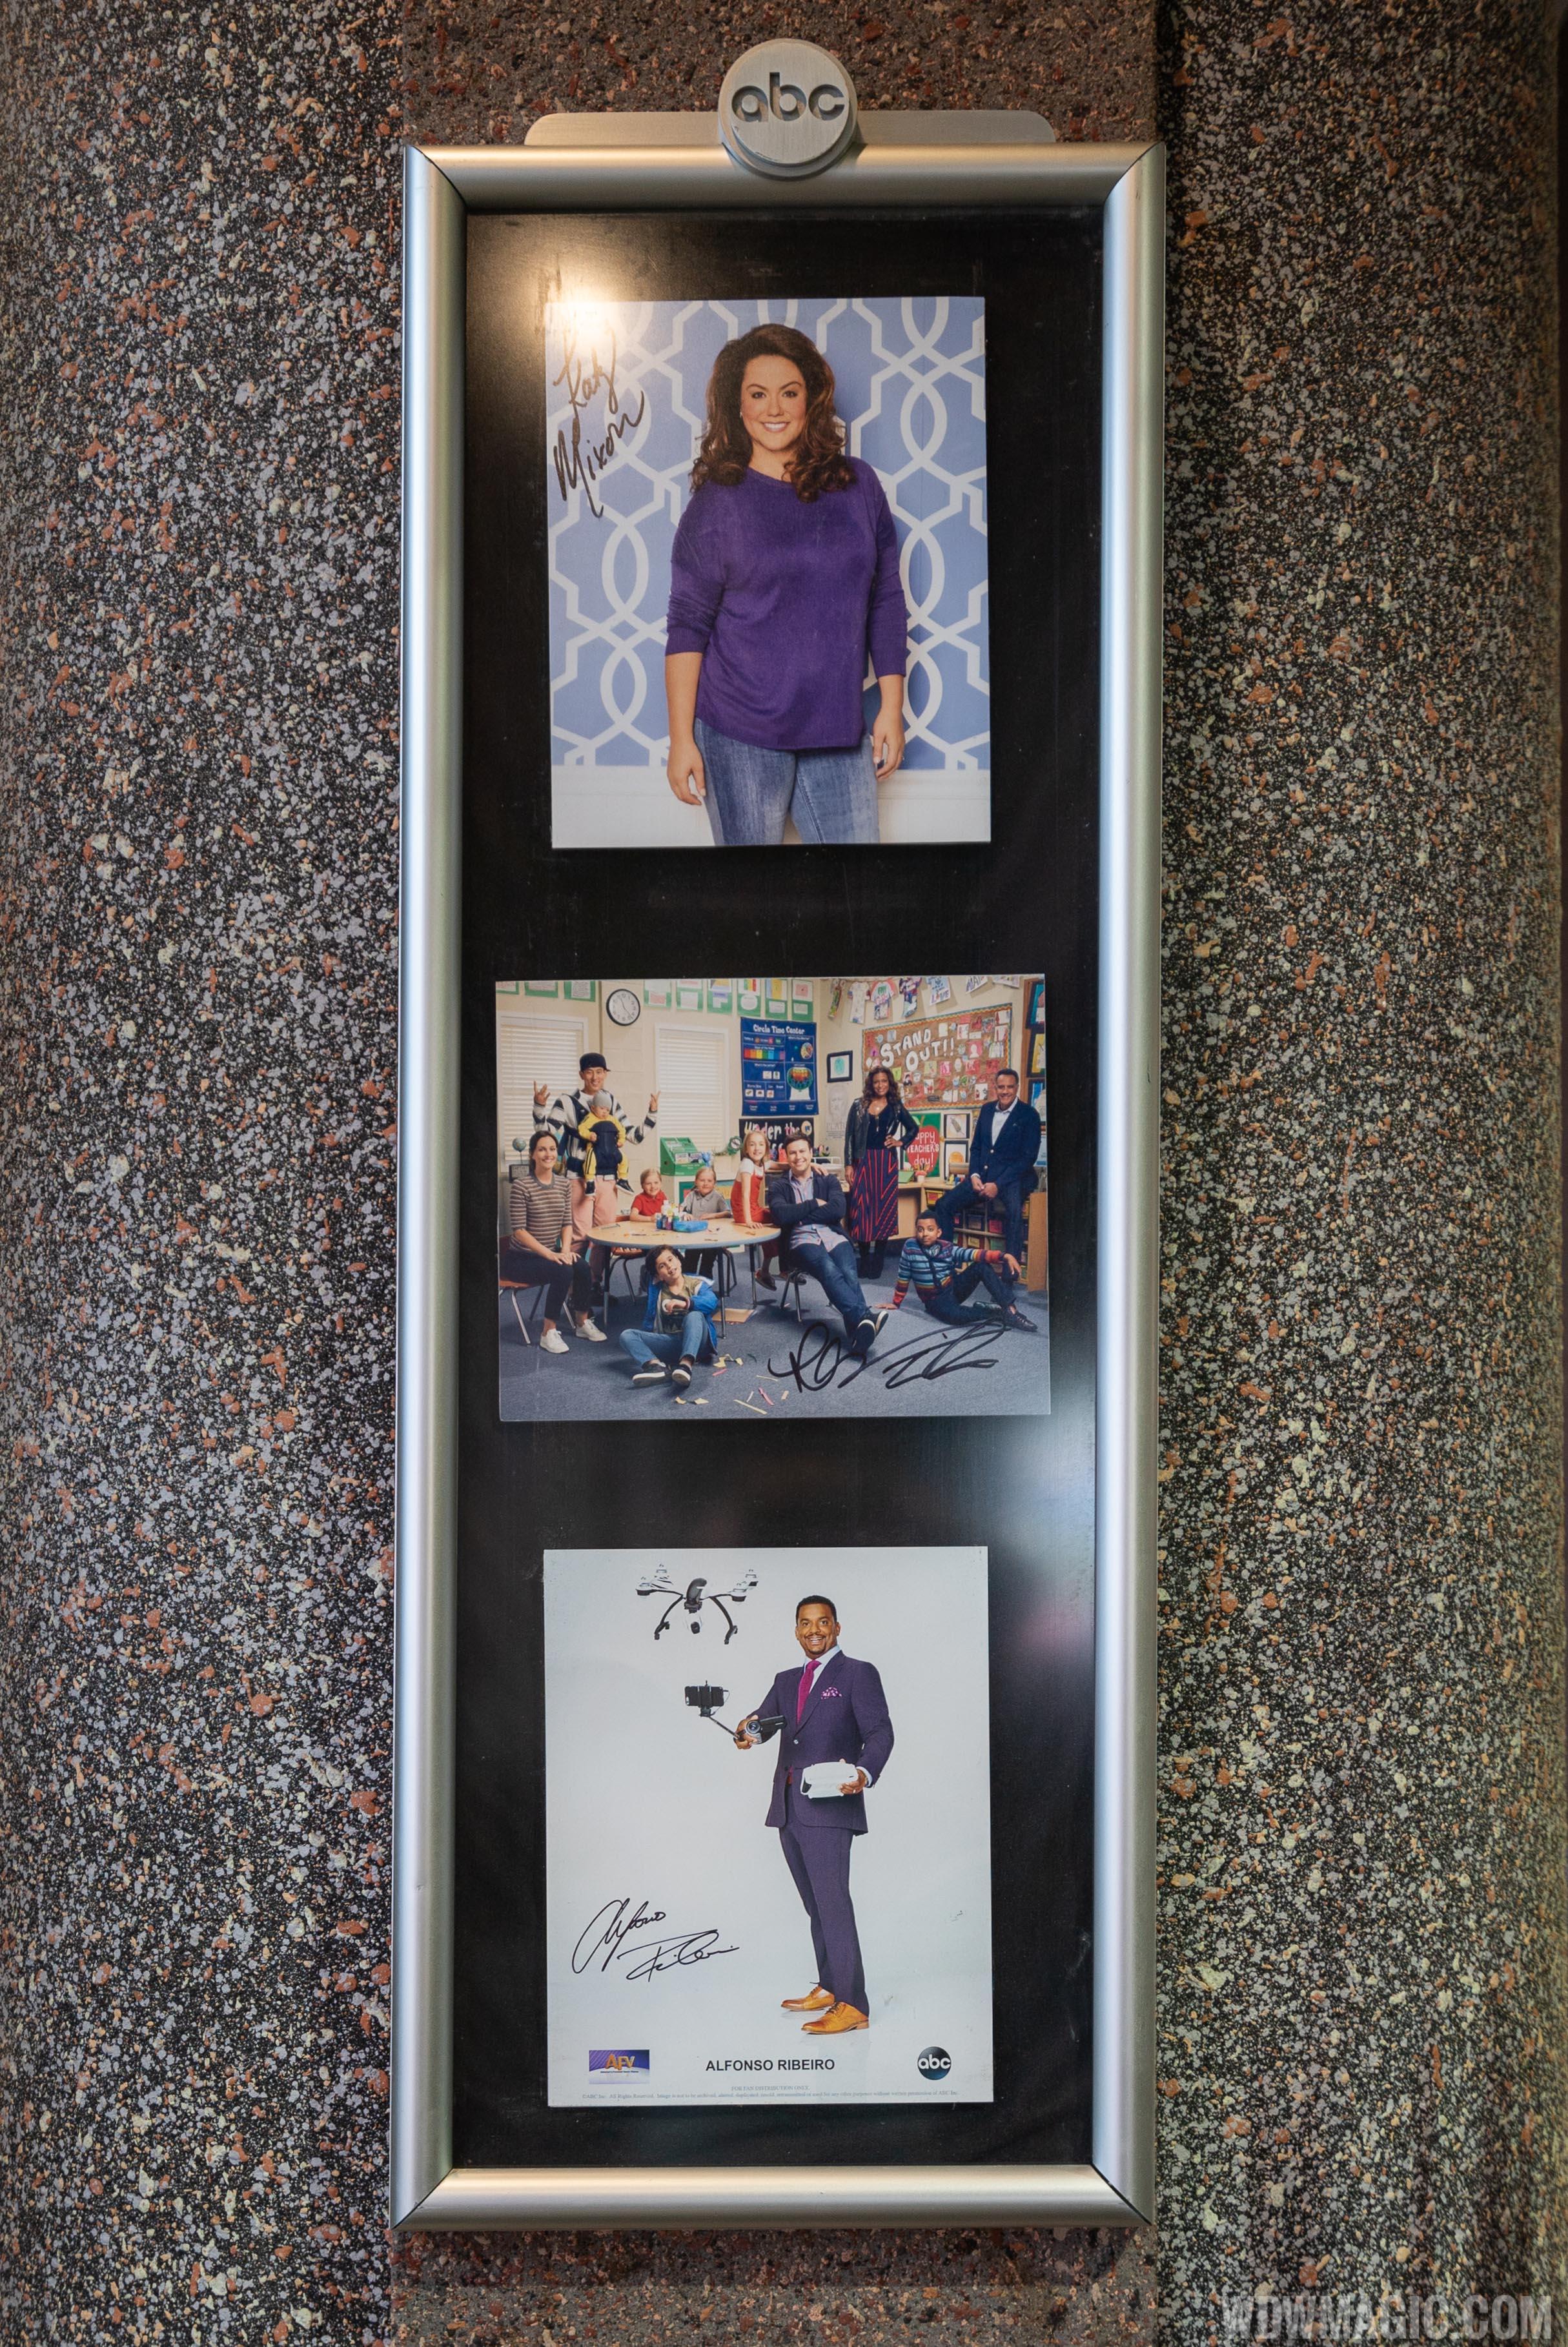 ABC Commissary Celebrity Autographs - November 2019